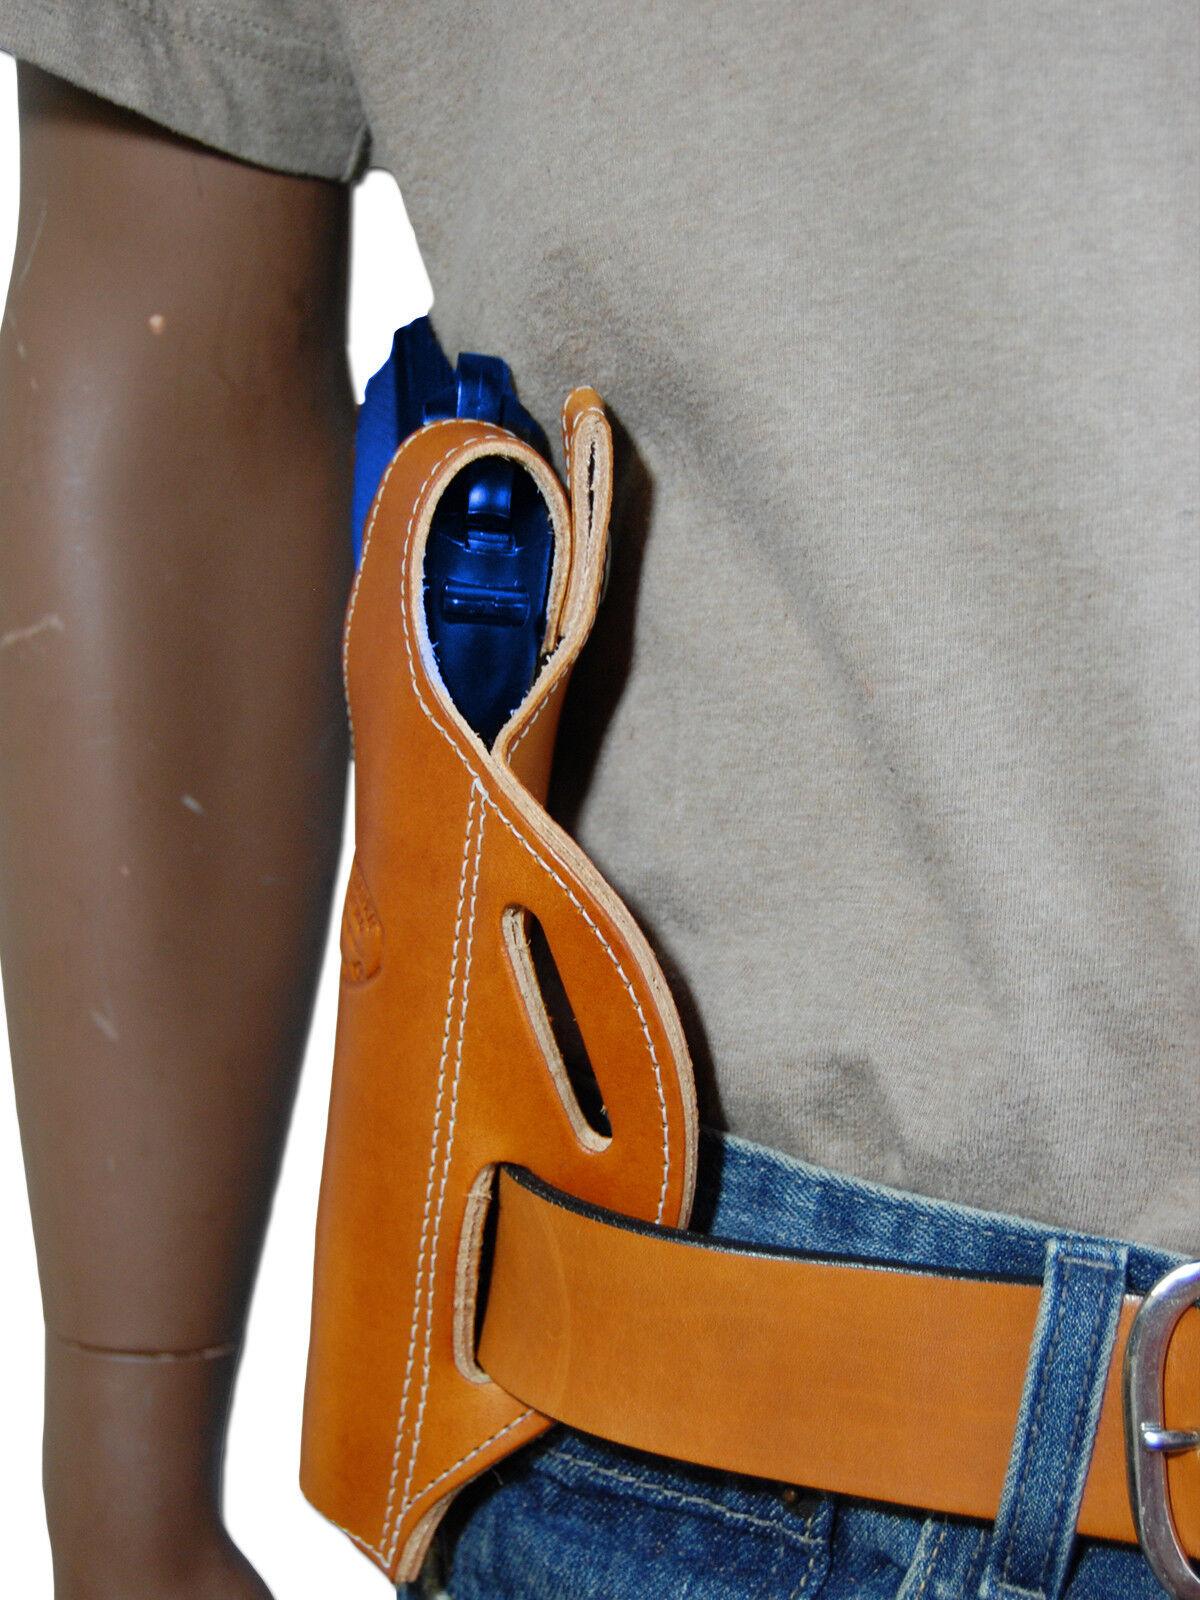 New Tan Leder Pancake Holster + Dbl Mag Pouch 9mm Springfield Full Größe 9mm Pouch 40 45 3bd144